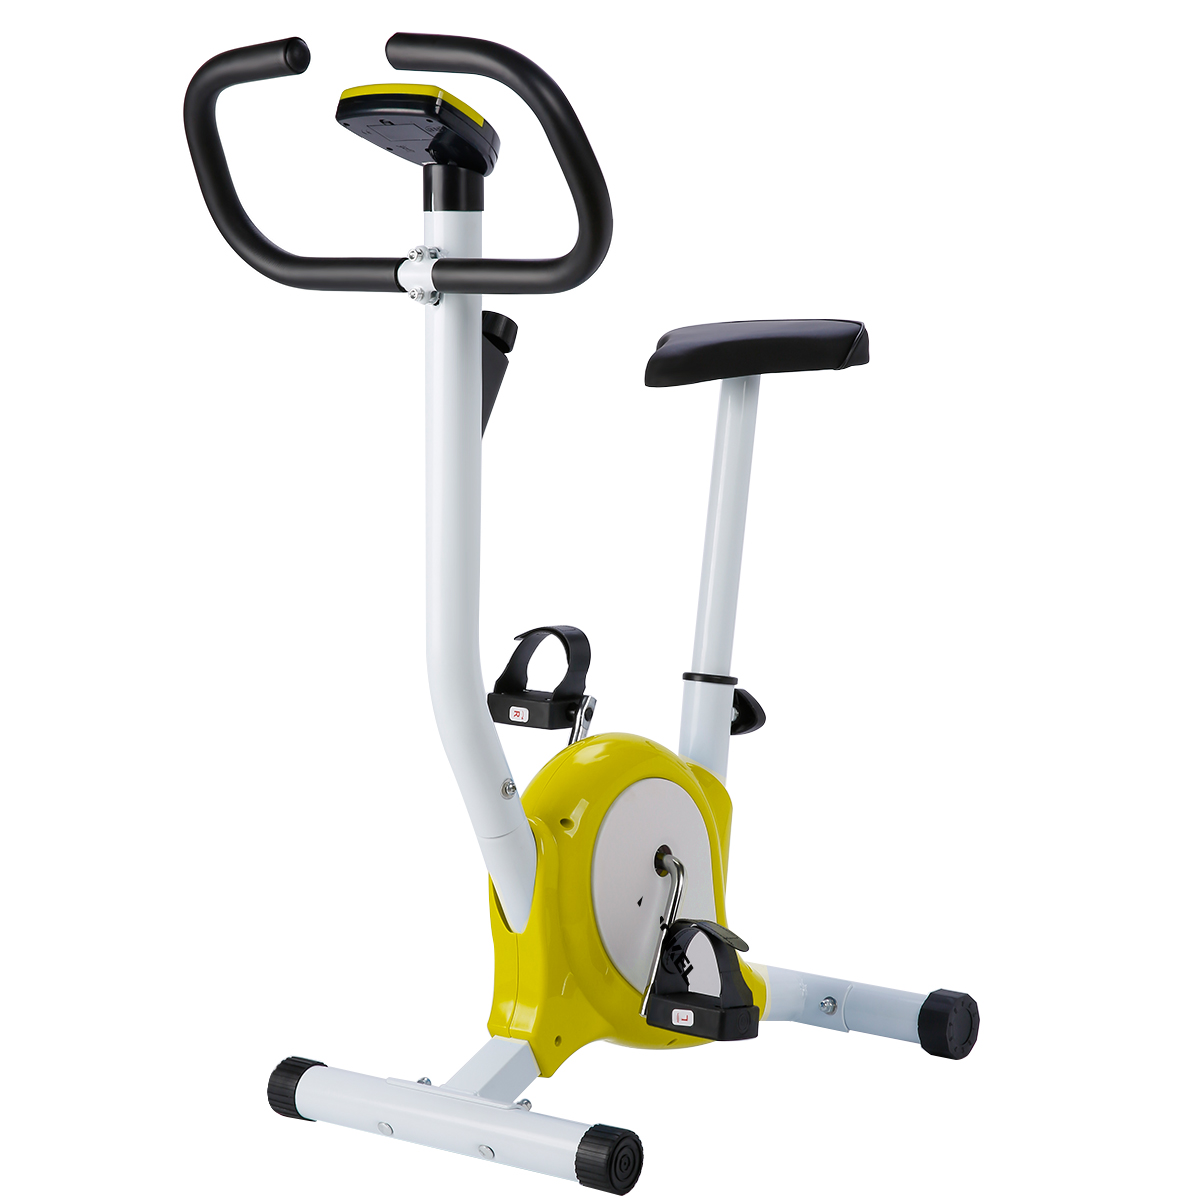 KUOKEL Durable Exercise Bicycle/Trainer Bike/Stable Upright Bike, Cardio Aerobic Equipment For Indoor & Outdoor Adjustable Seat & resistance